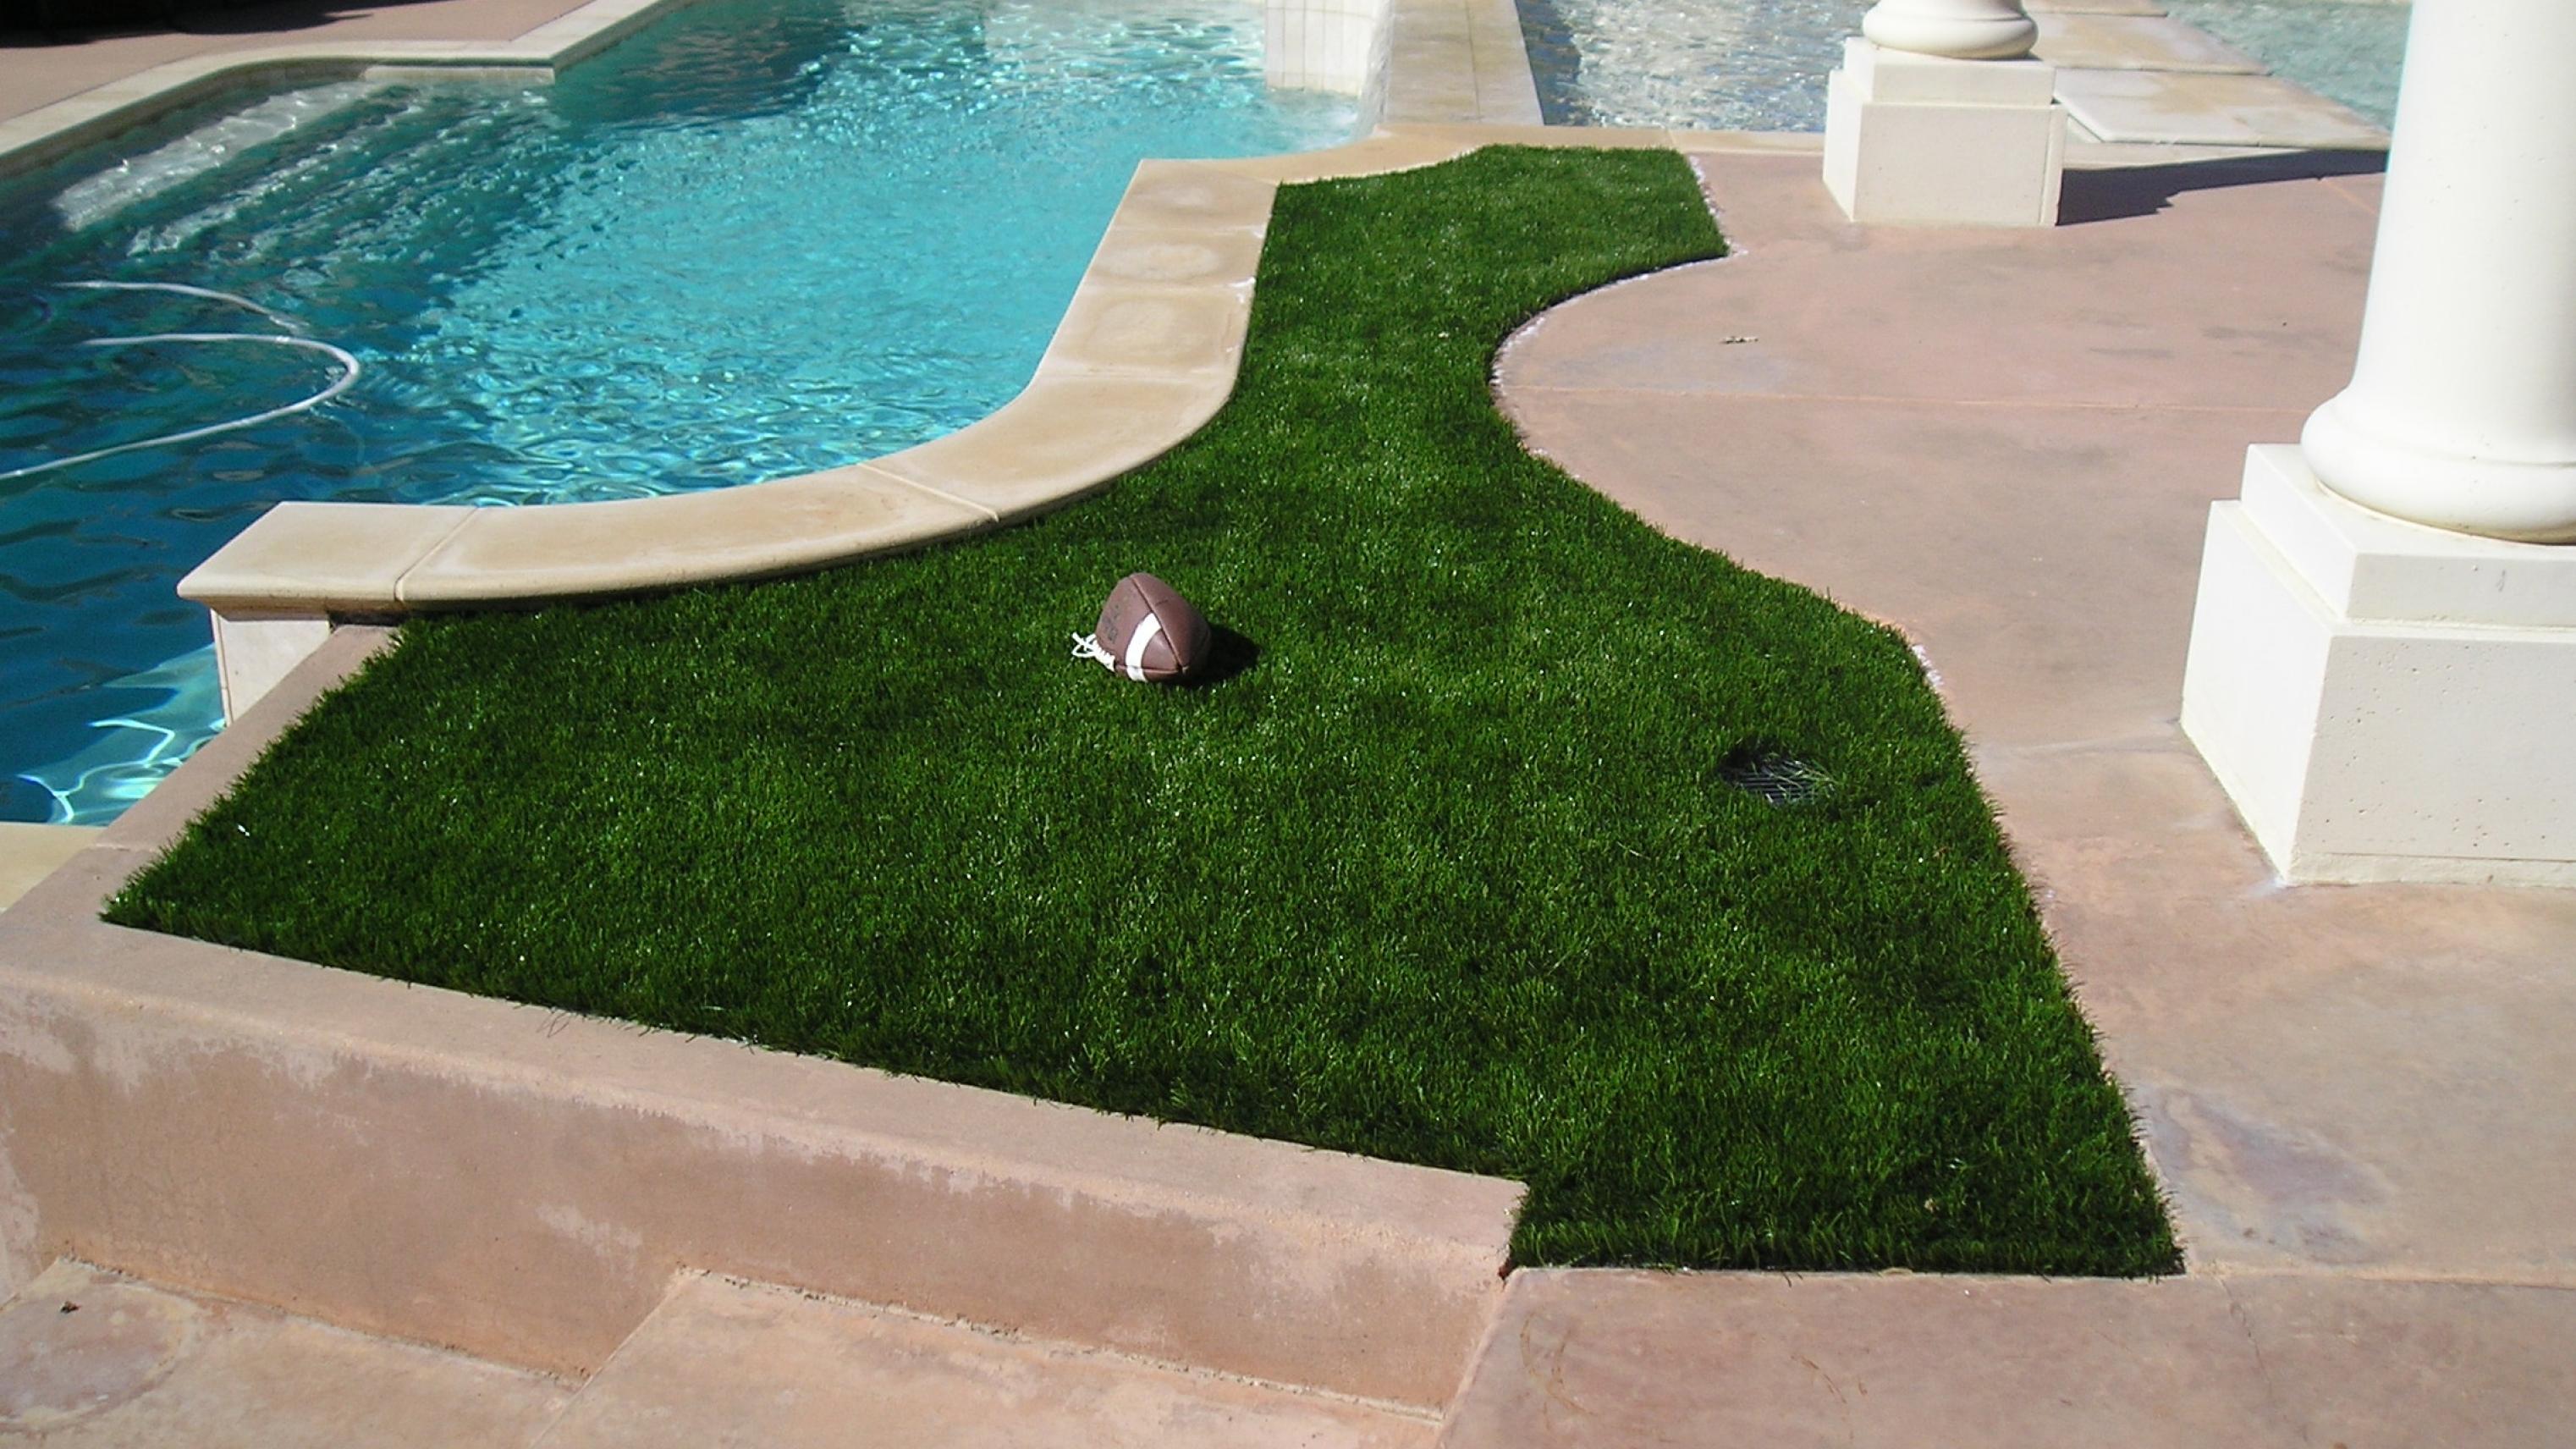 S Blade-90 Green on Green backyard turf,turf backyard,fake grass for backyard,fake grass backyard,artificial grass backyard